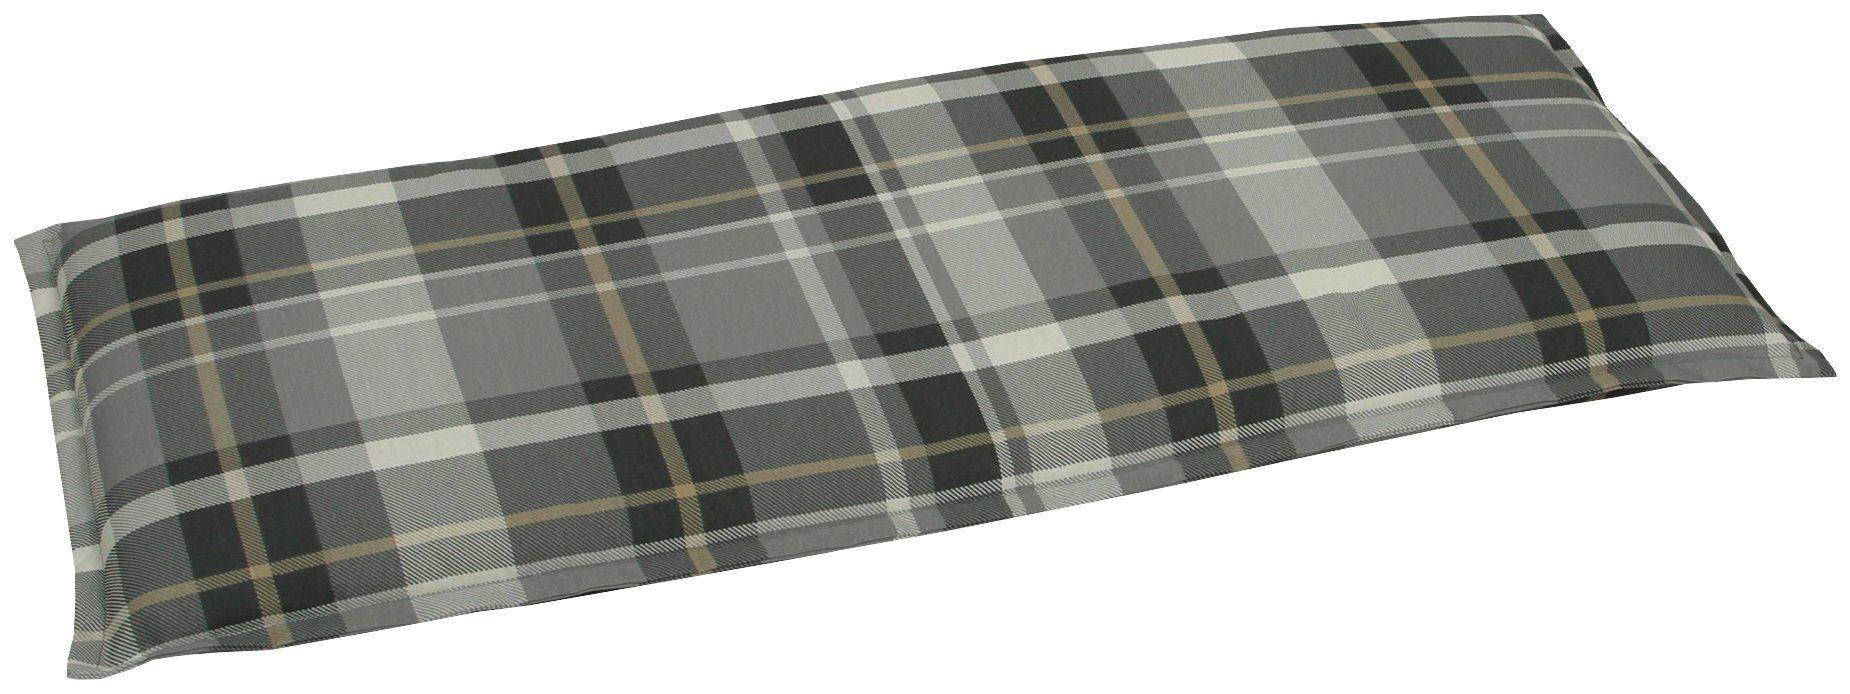 GO-DE Bankauflage (L/B): ca. 115x45 cm